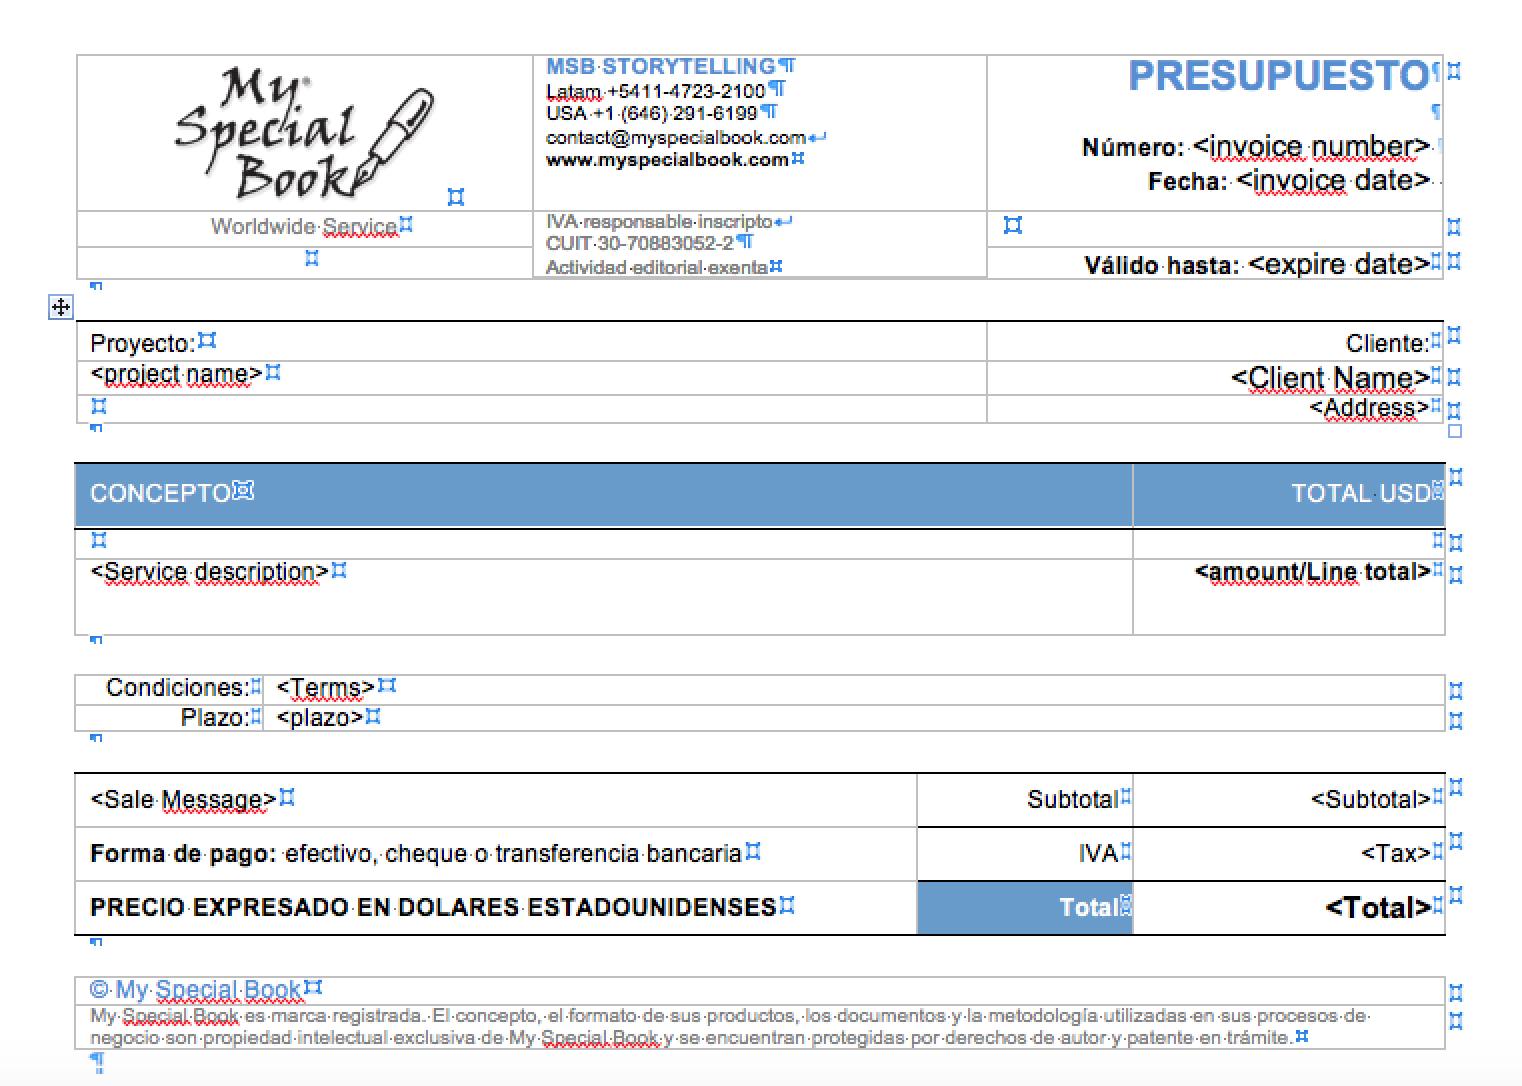 Solved: Importing Custom Invoice Templates into QuickBooks